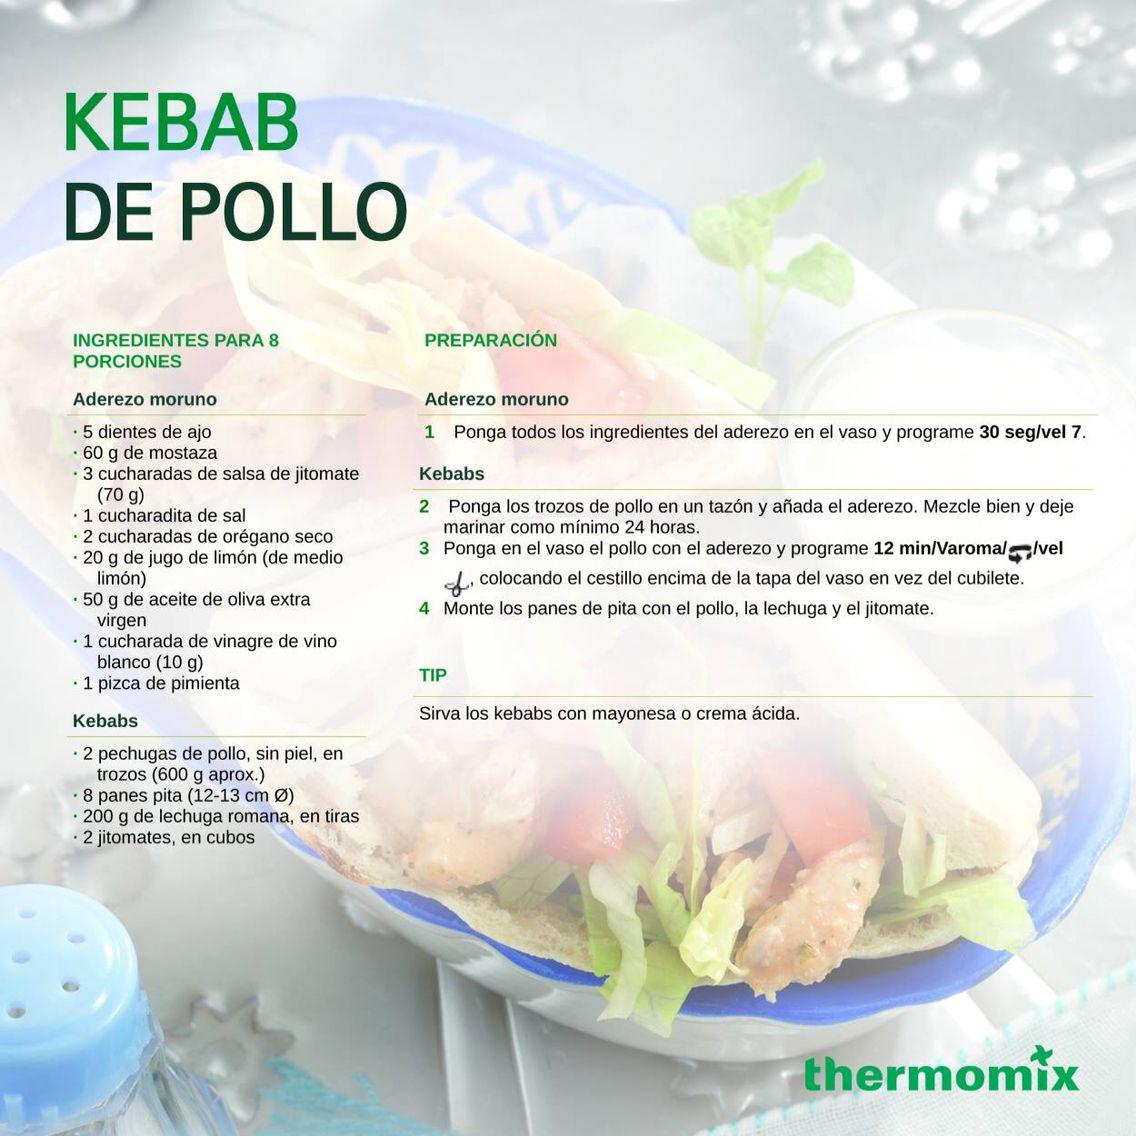 Kebab De Pollo Kebab De Pollo Kebab Salsa De Jitomate